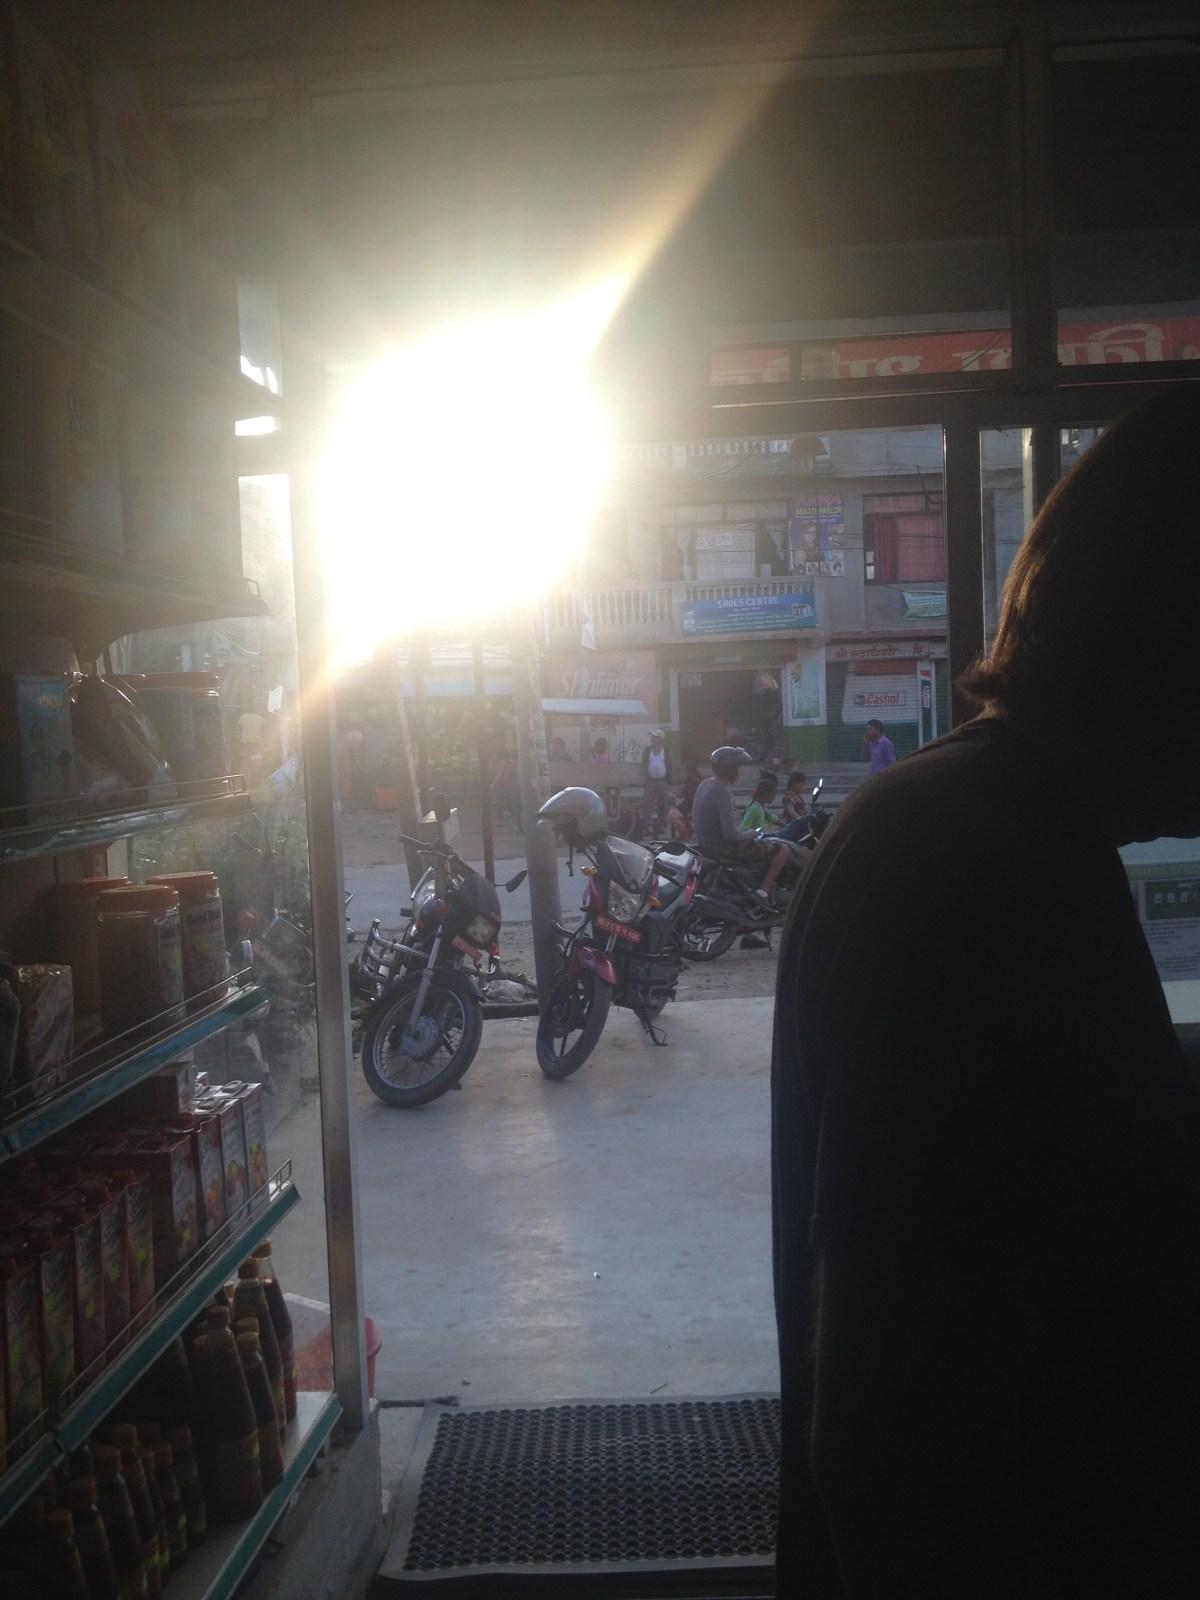 Nepal Travel: John Asks for Directions to Organic Store in Kathmandu